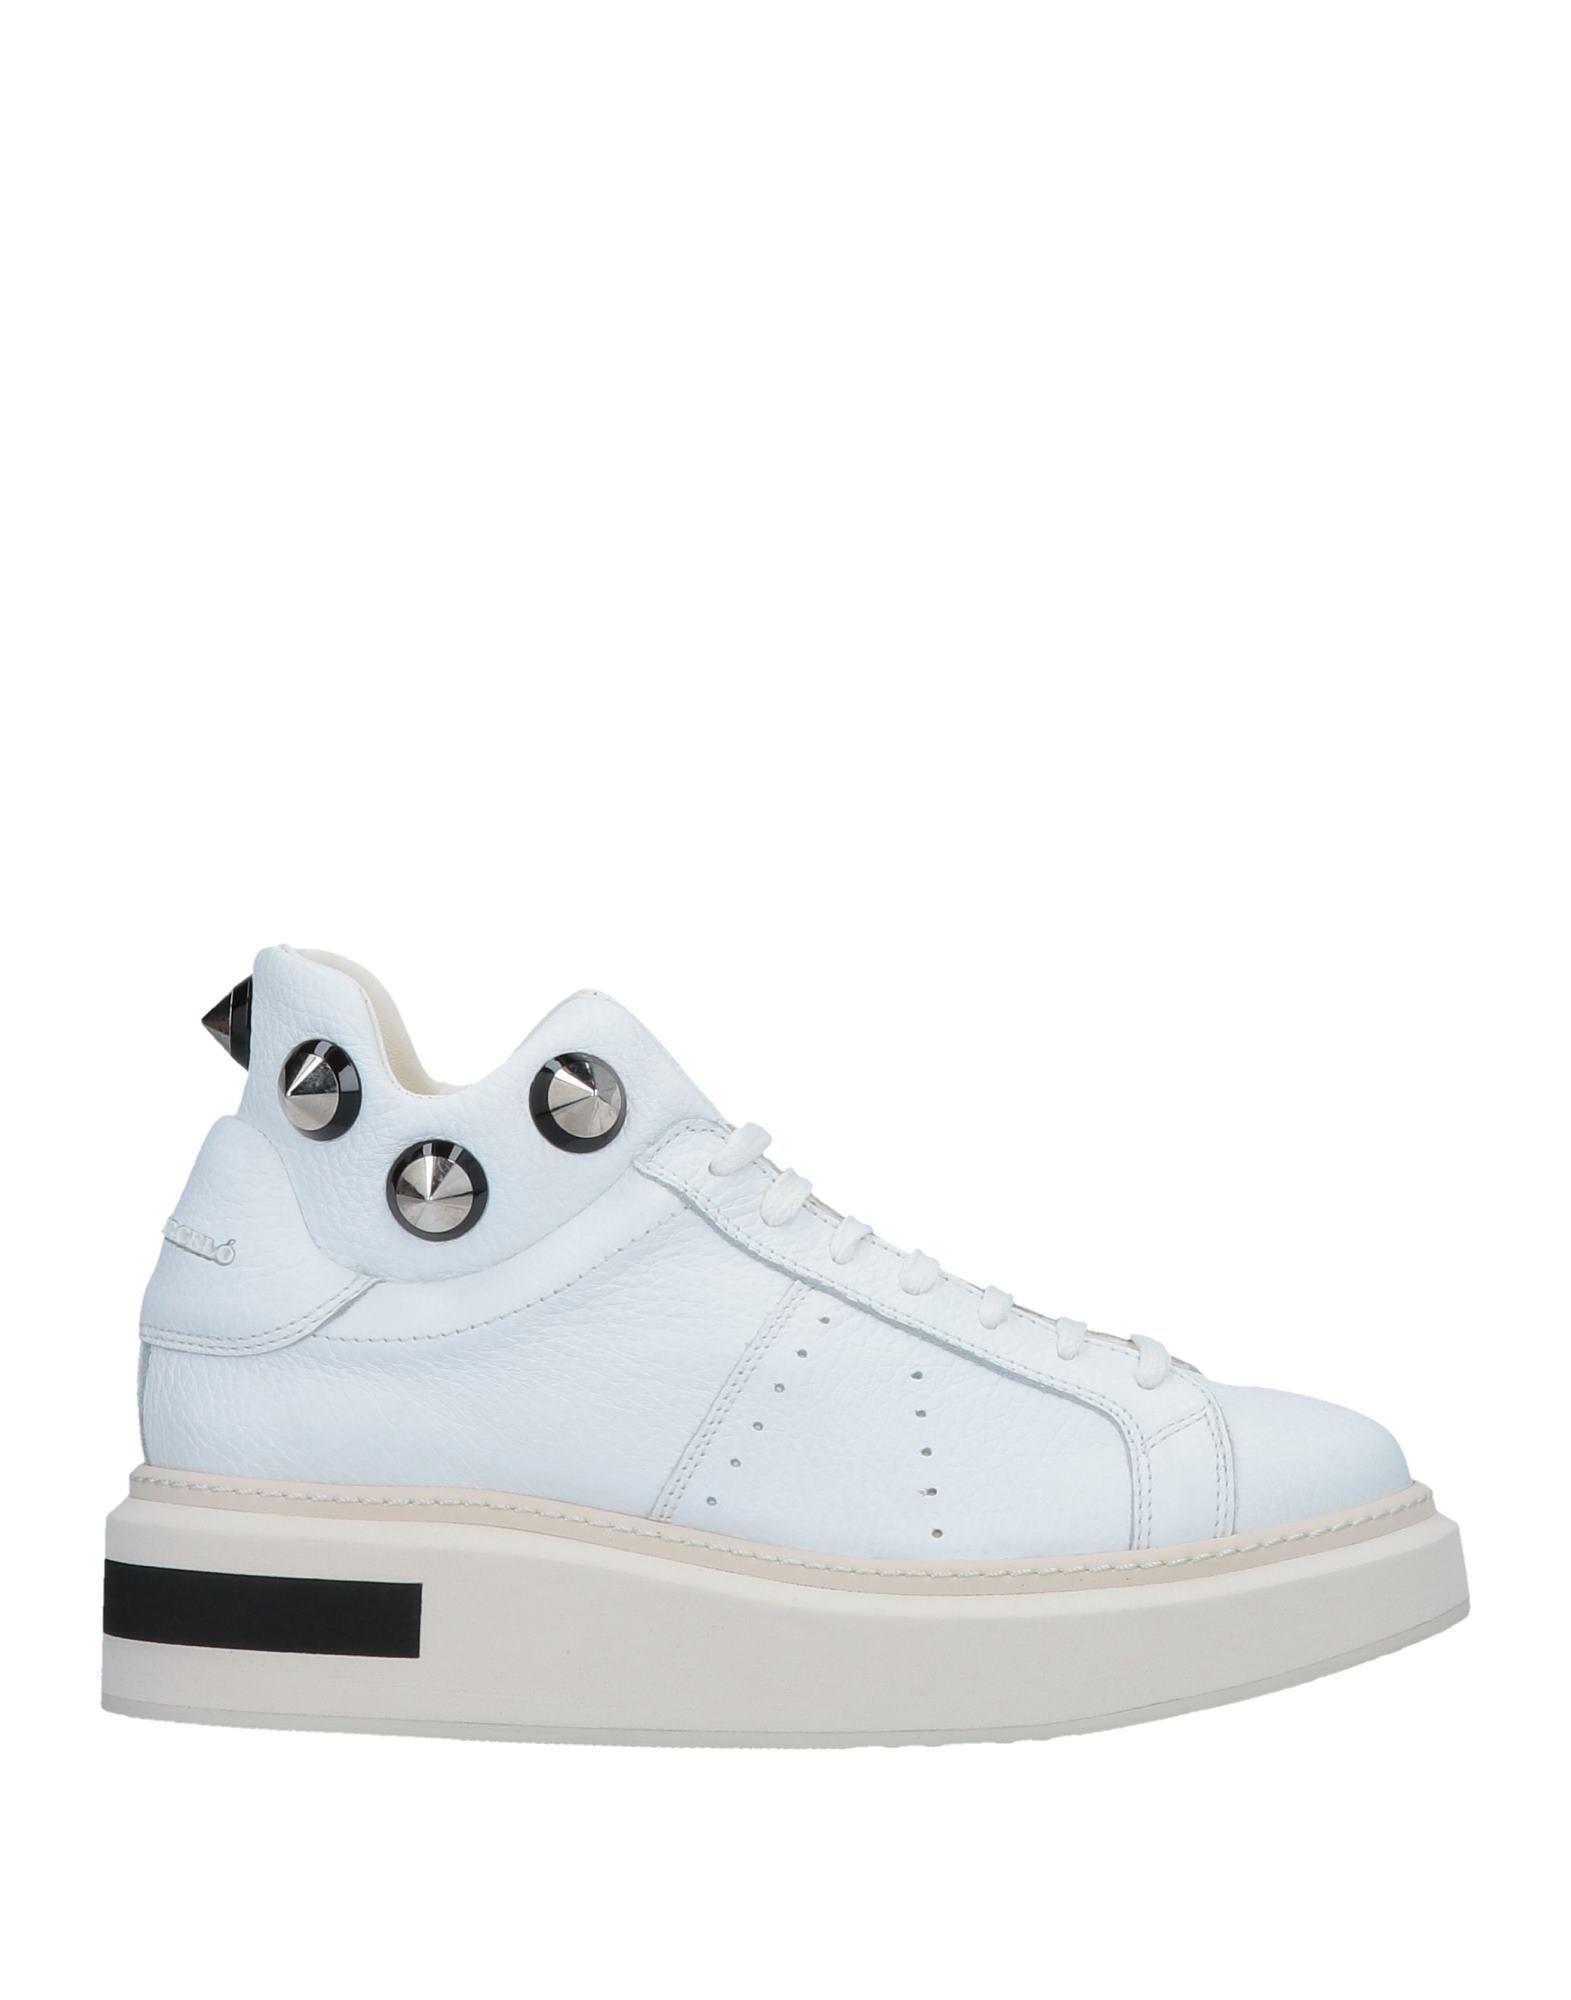 Manuel Barceló Sneakers Damen  11511520OD Neue Schuhe